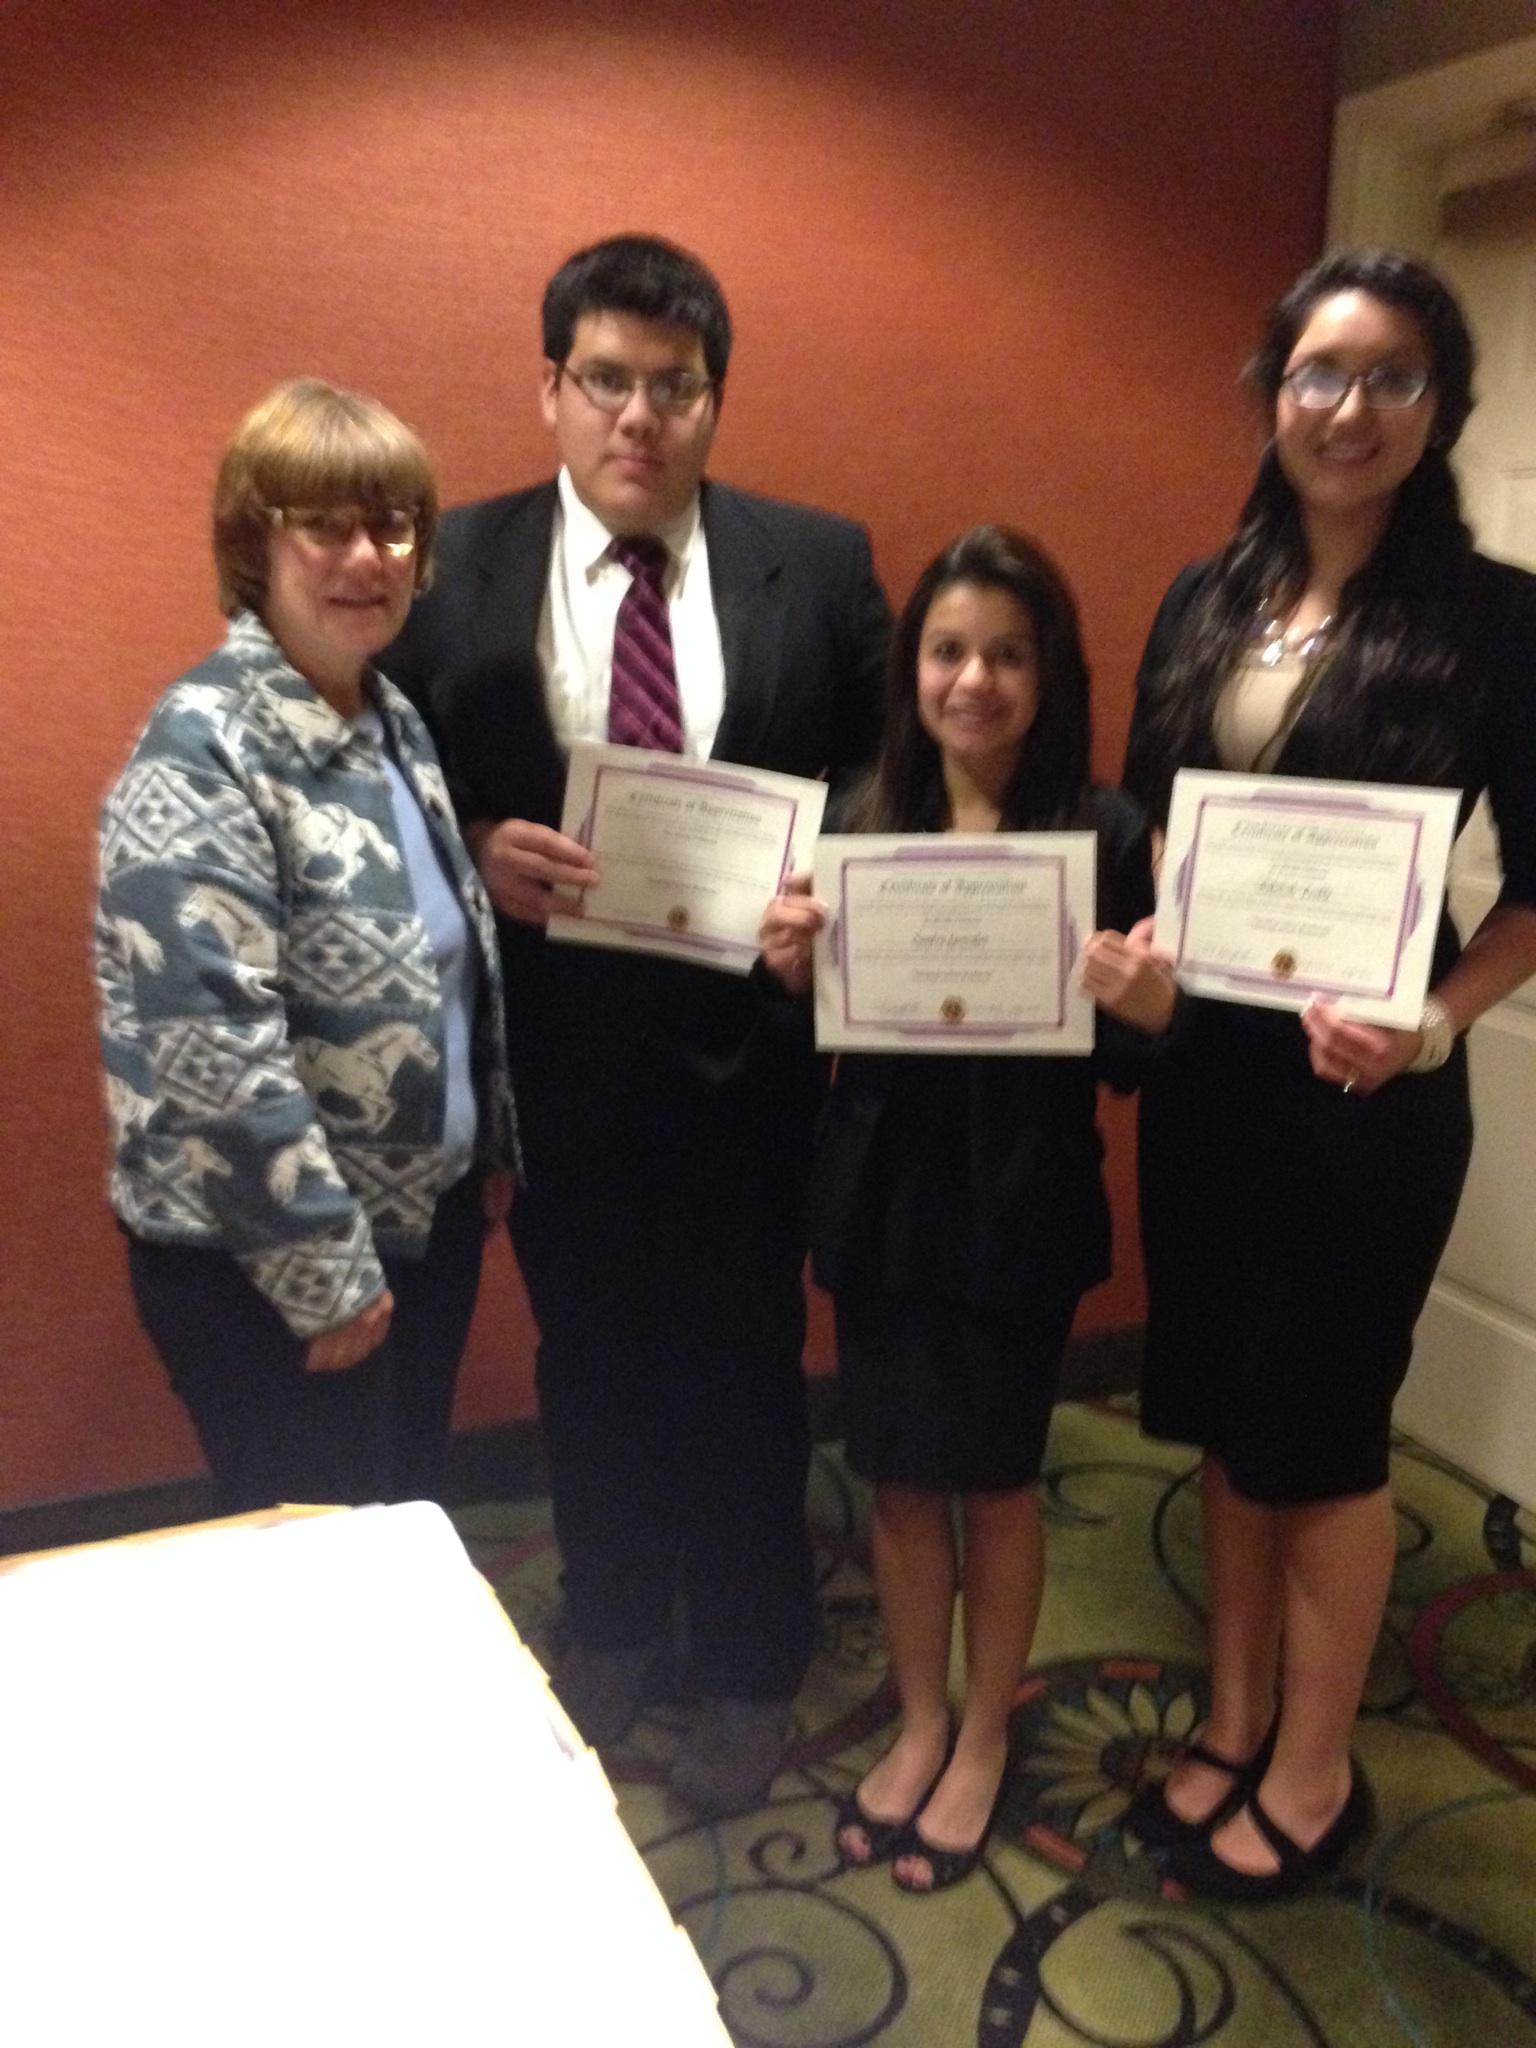 Mesquite Lions Announce 2015 Winner Of Student Speech Contest